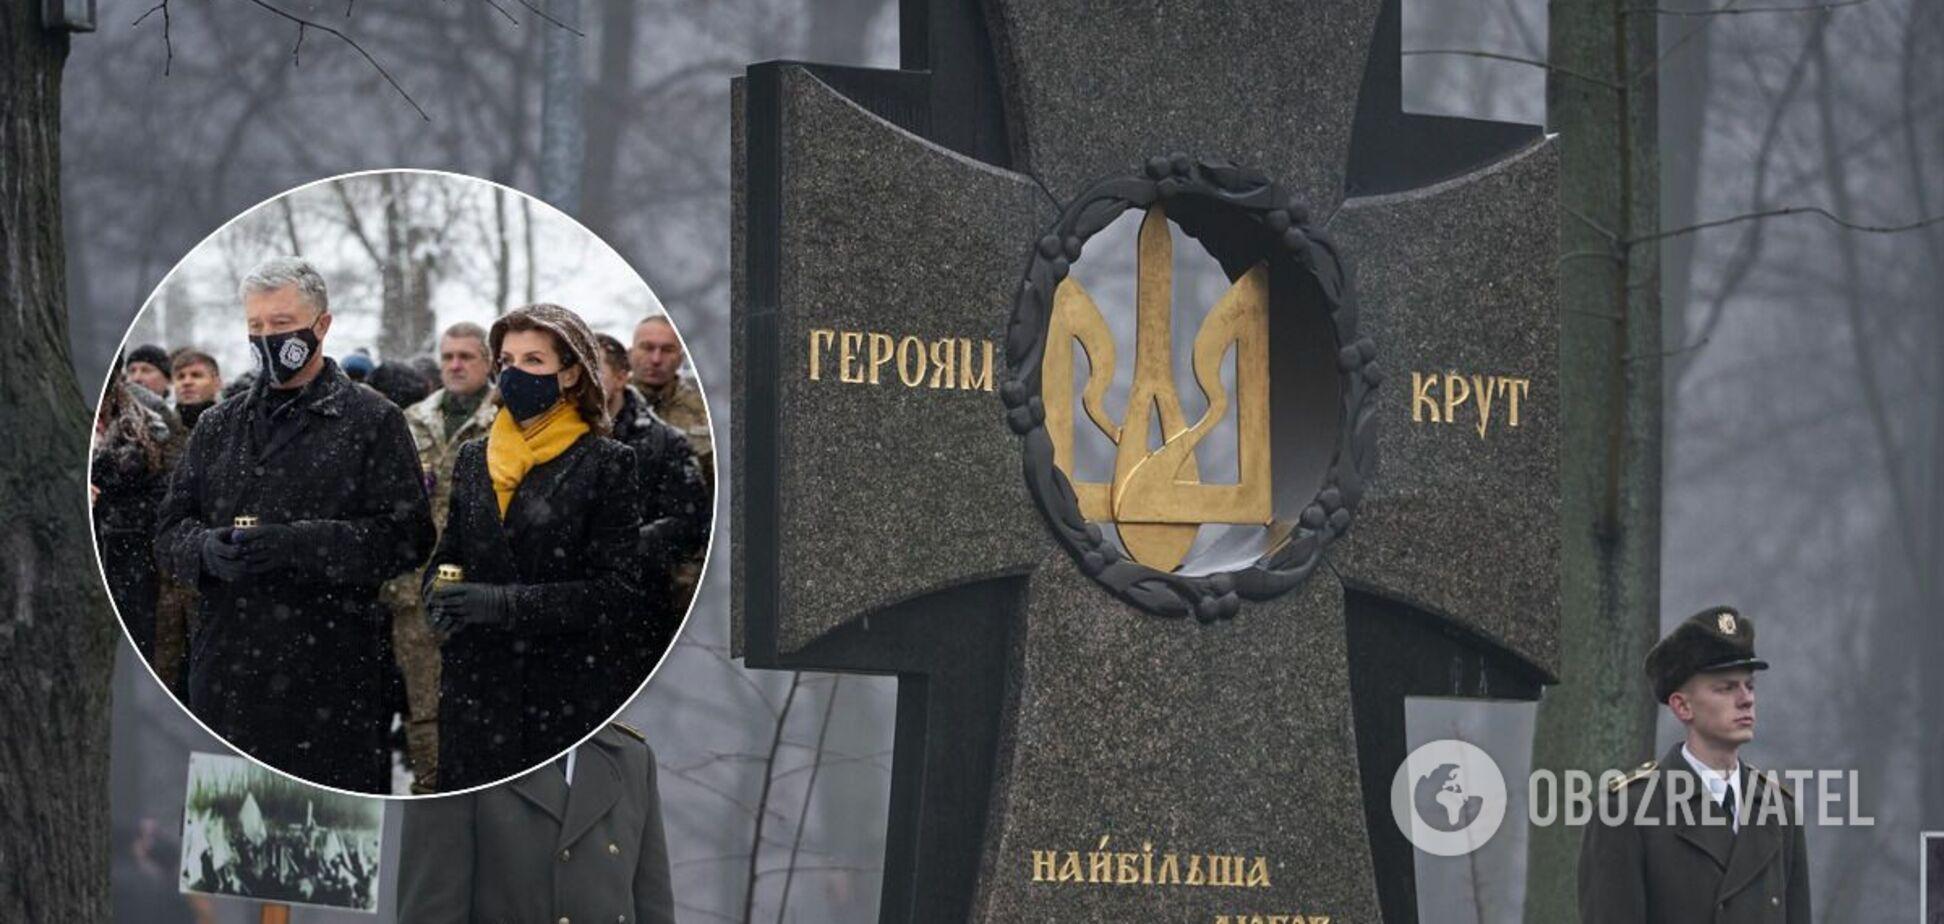 Порошенко: подвиг Героїв Крутнадихає ще більше любити Україну